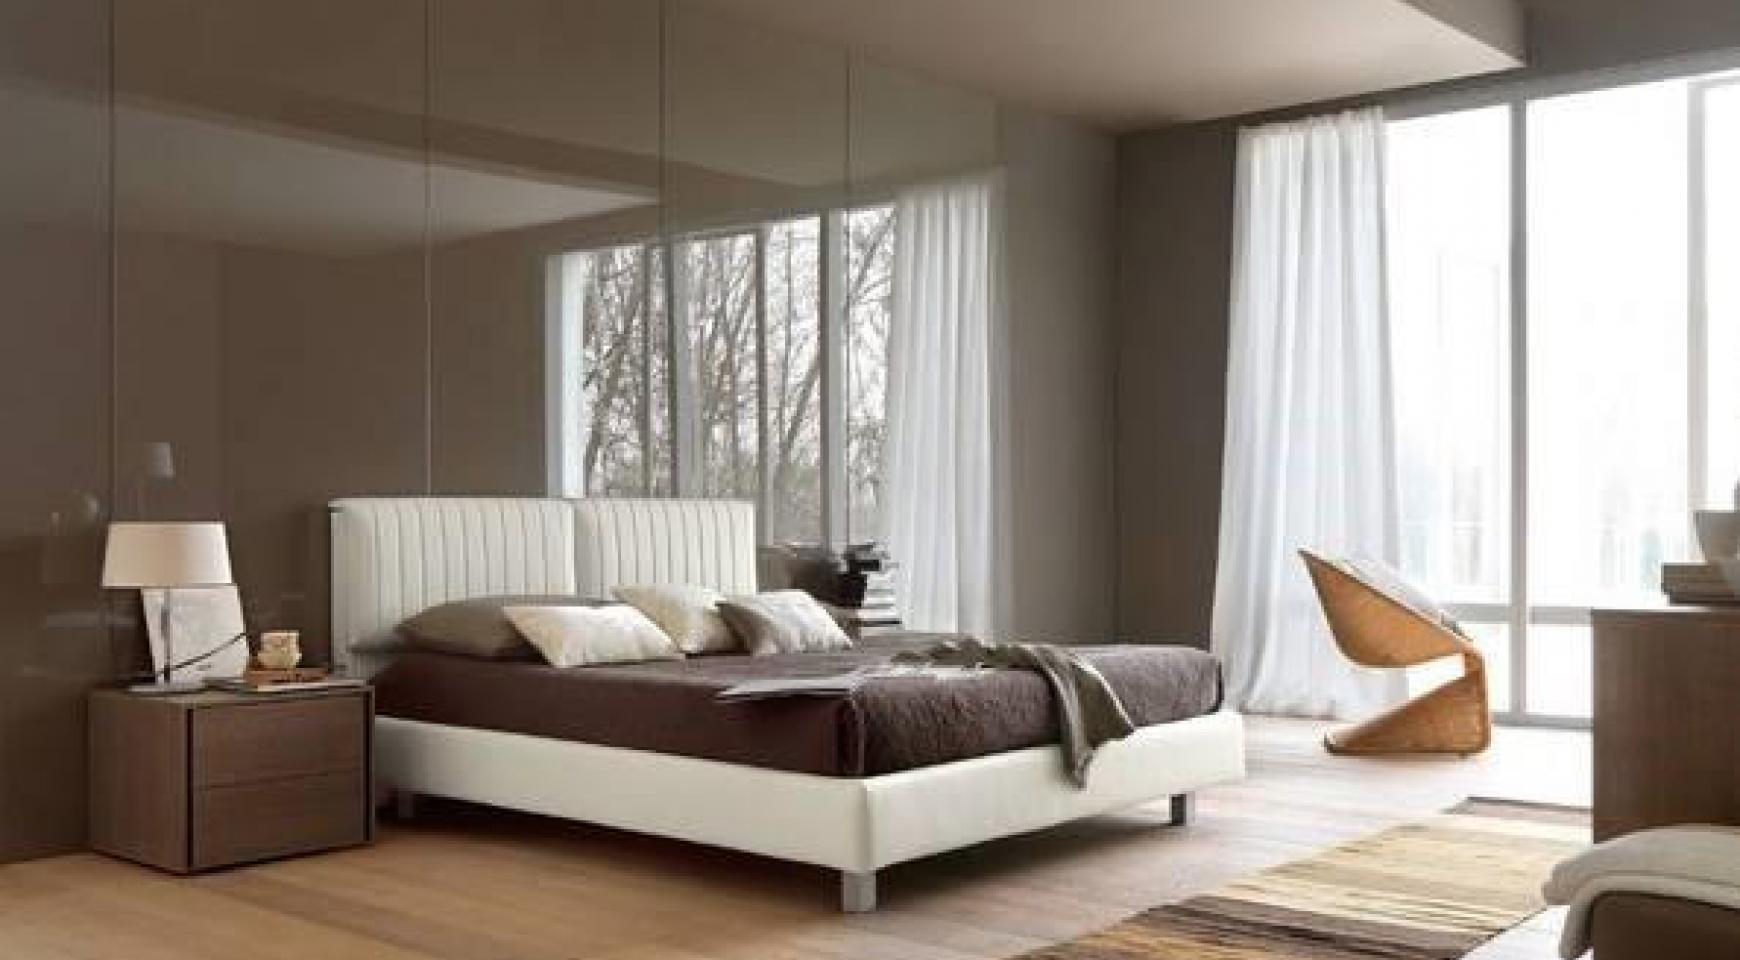 Luxurious Contemporary 5 Bedroom Villa near the Sea - 10